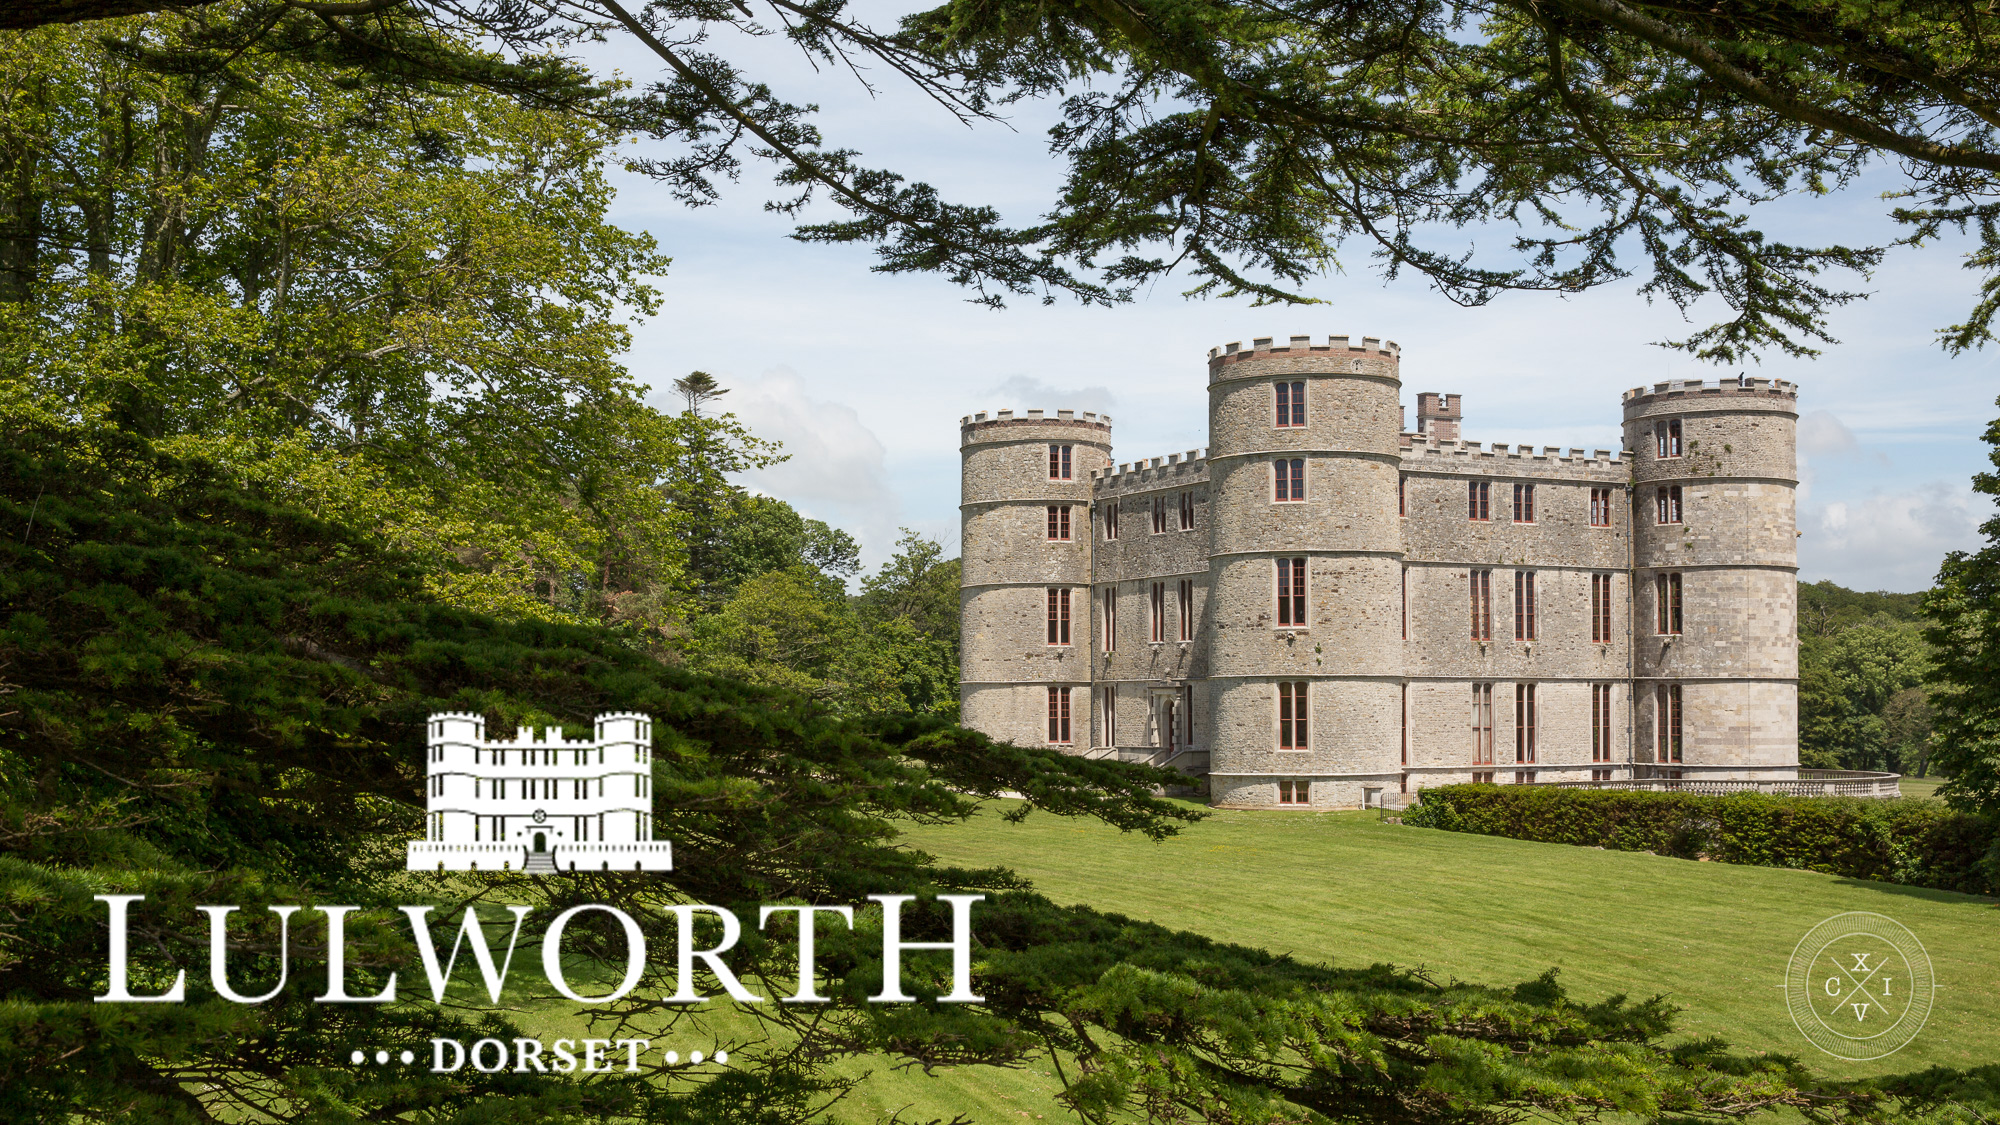 Lulworth Castle | Lulworth | Dorset